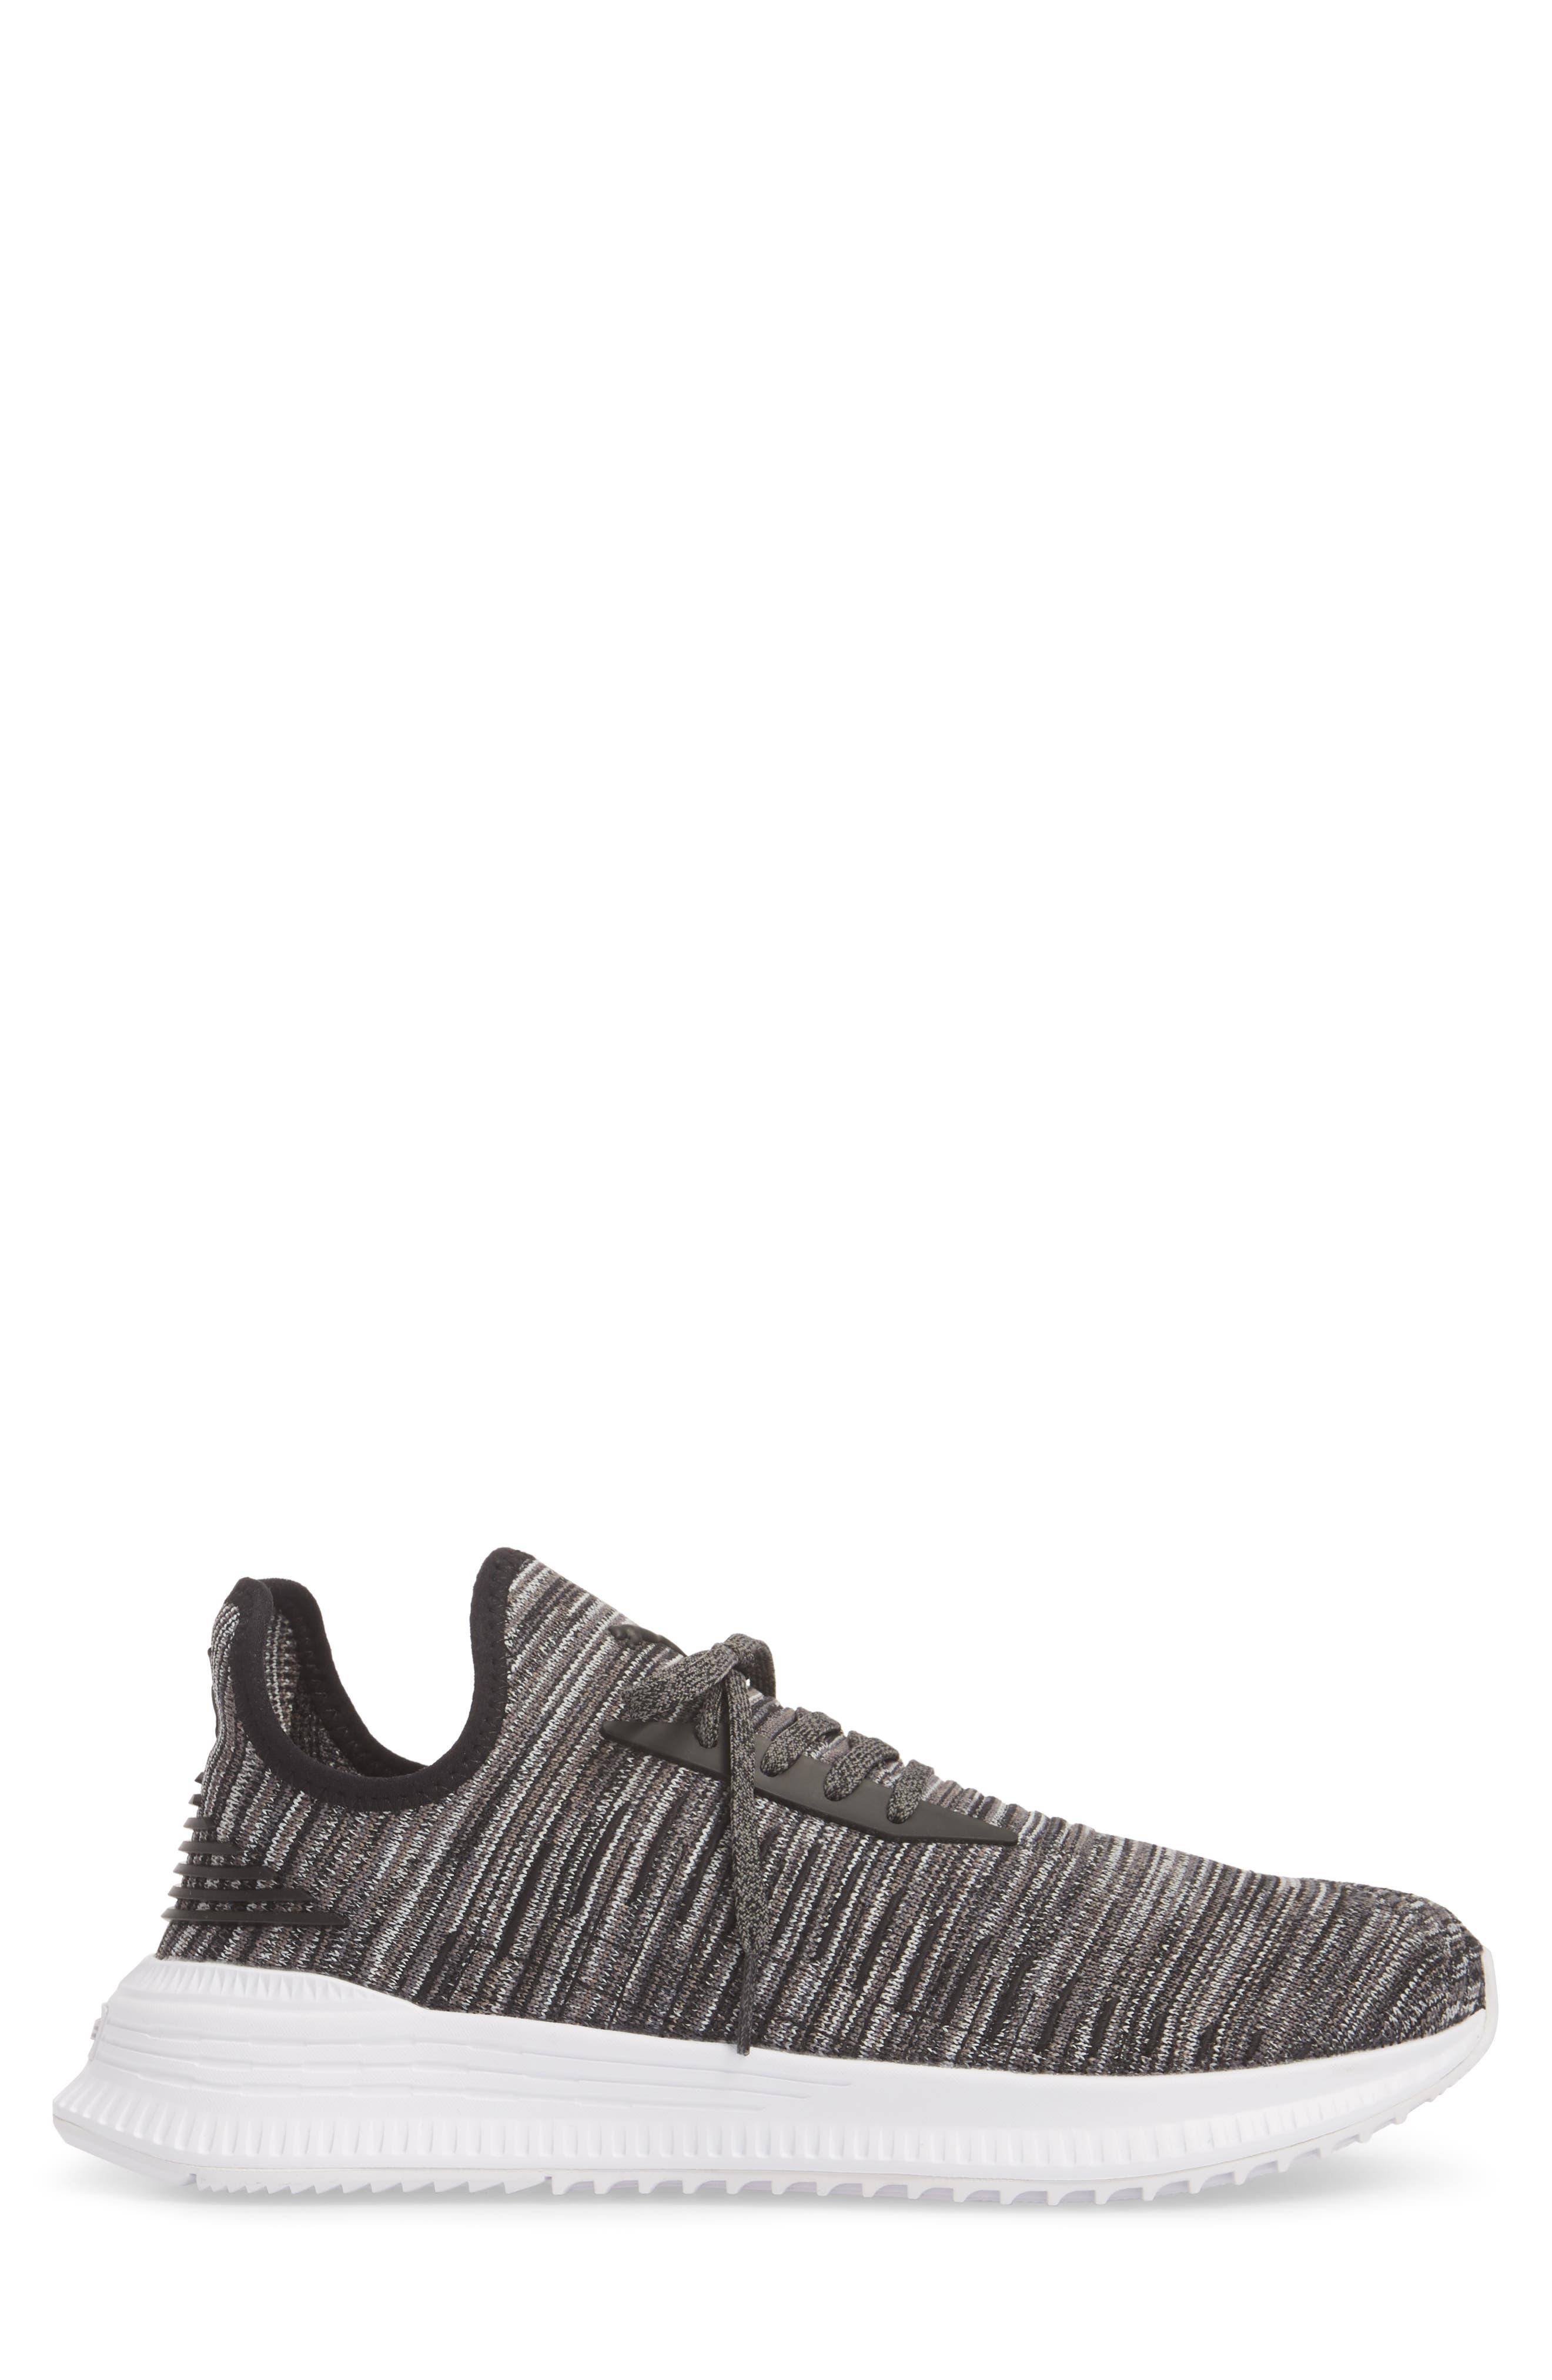 Tsugi 90 Sneaker,                             Alternate thumbnail 3, color,                             Black